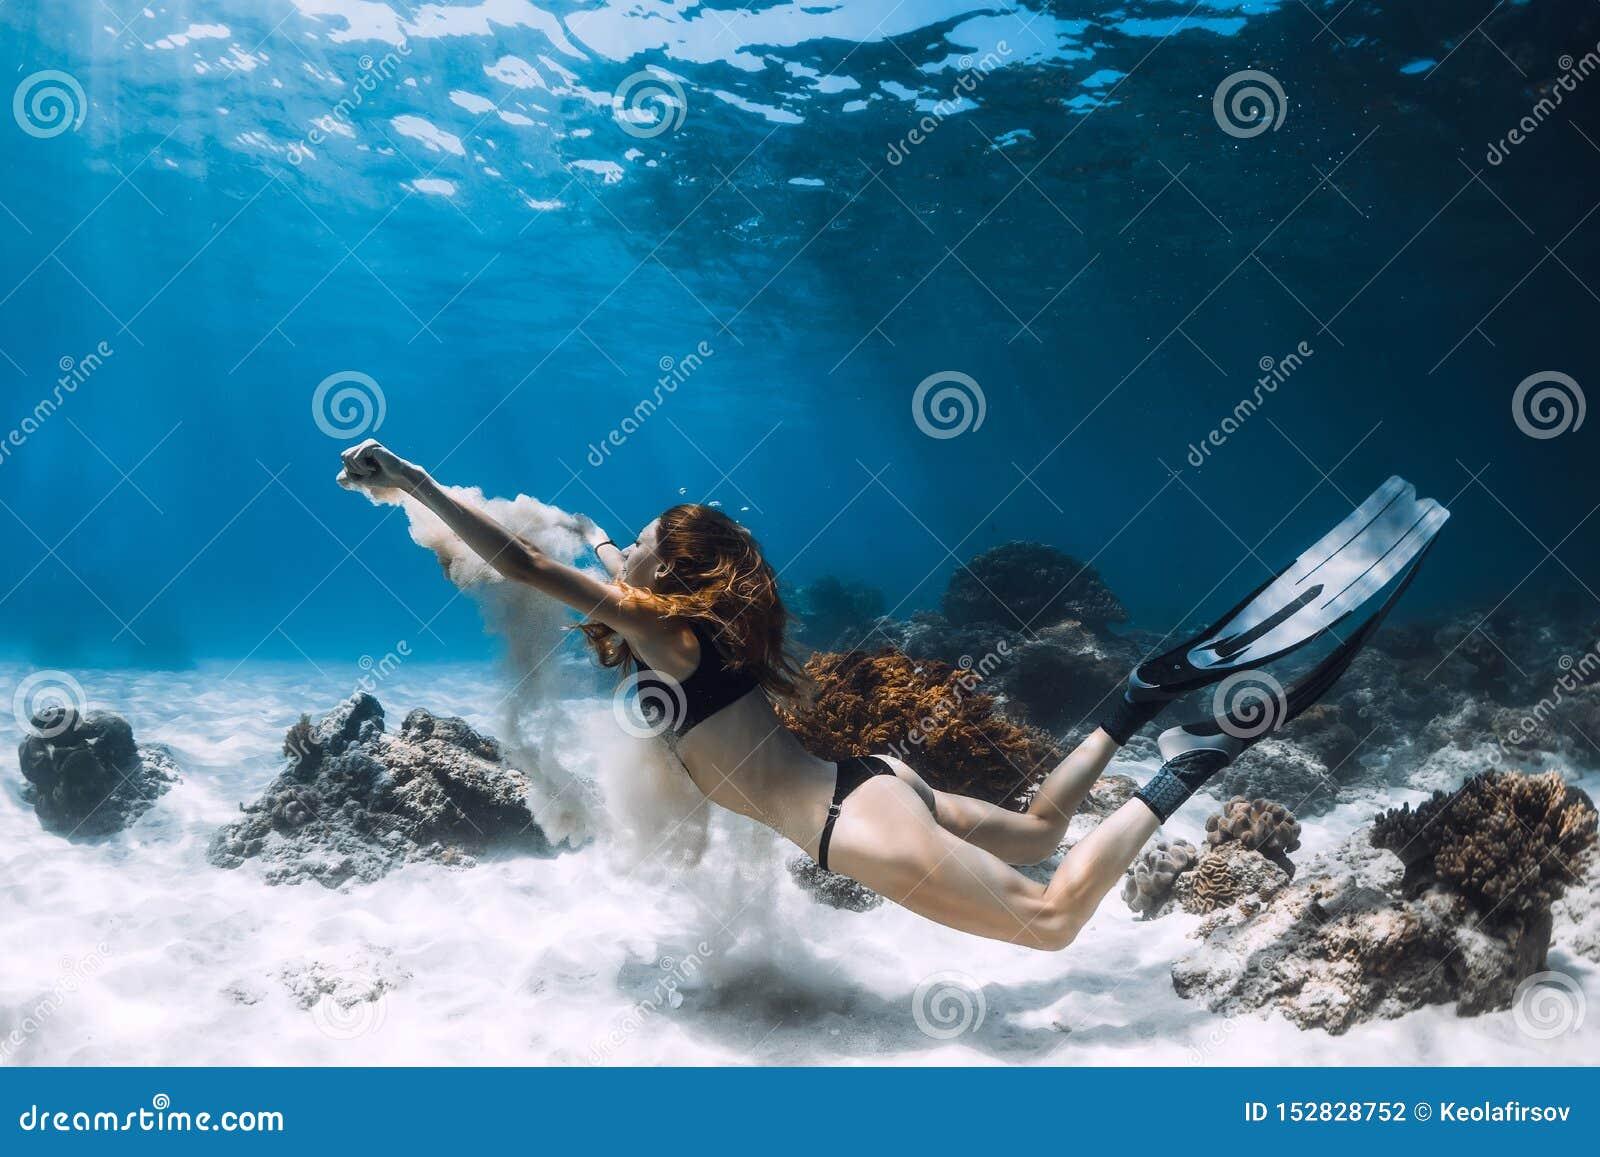 Woman freediver swim underwater over sandy bottom with sand